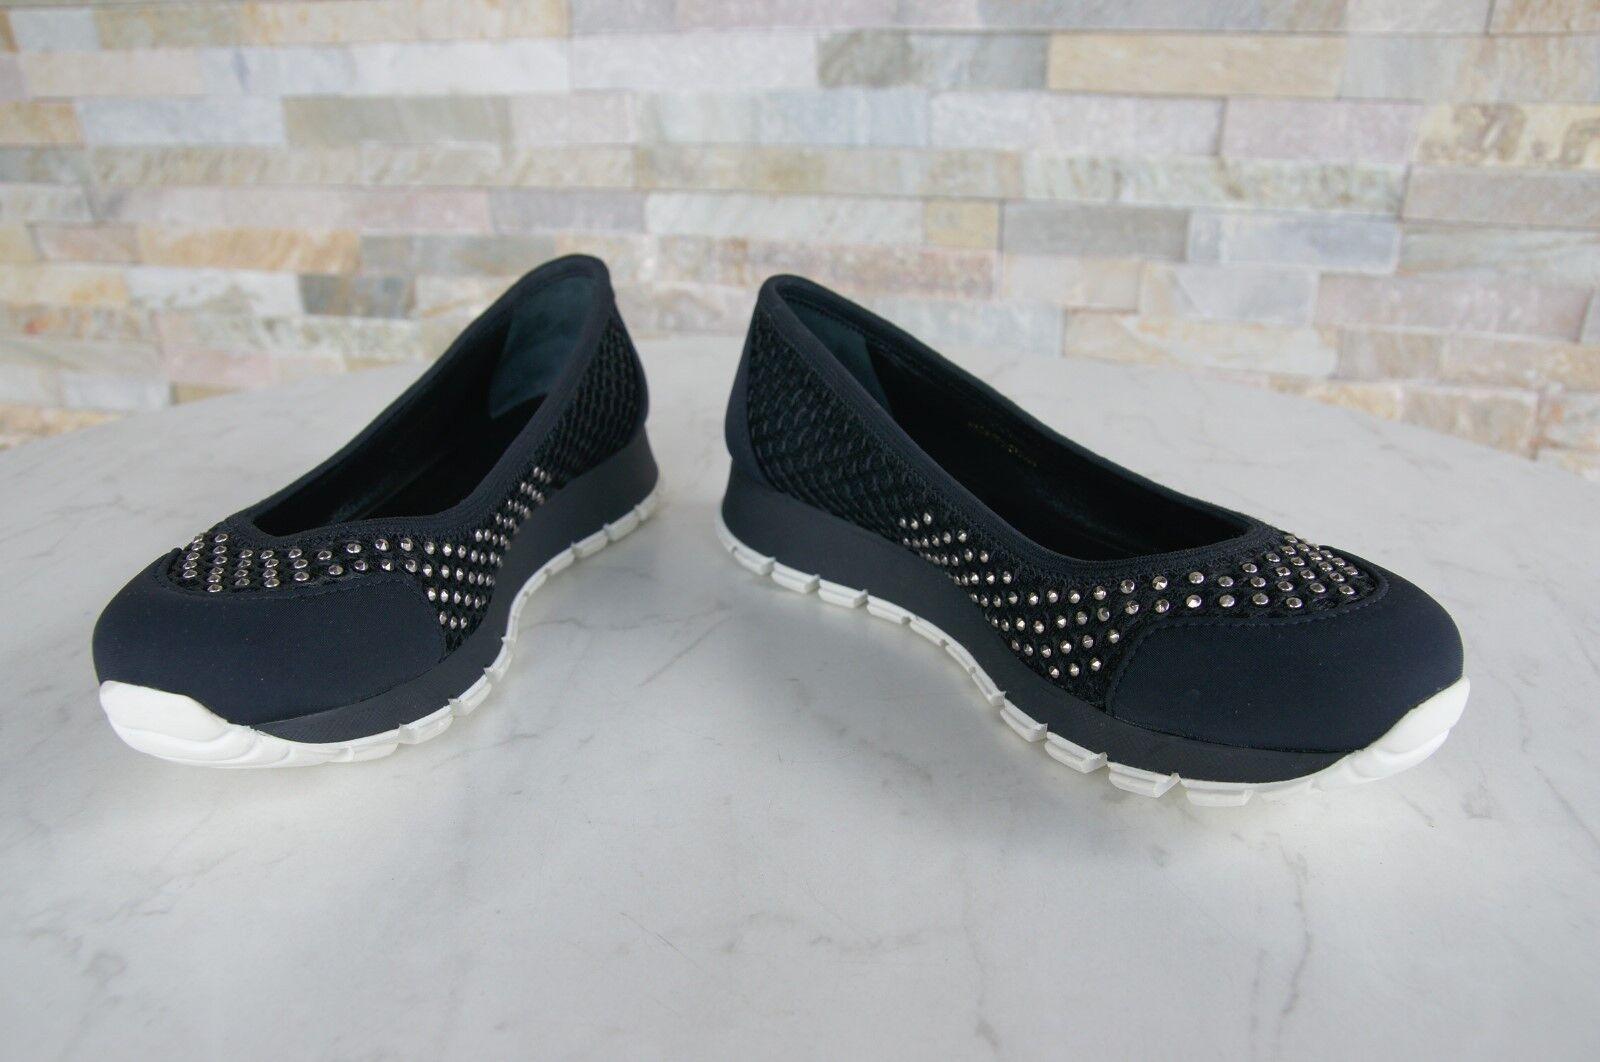 PRADA Gr 37 Ballerinas Slipper Schuhe Schuhe Schuhe BEE 3F6158  schwarz NEU ehem.   695f4e